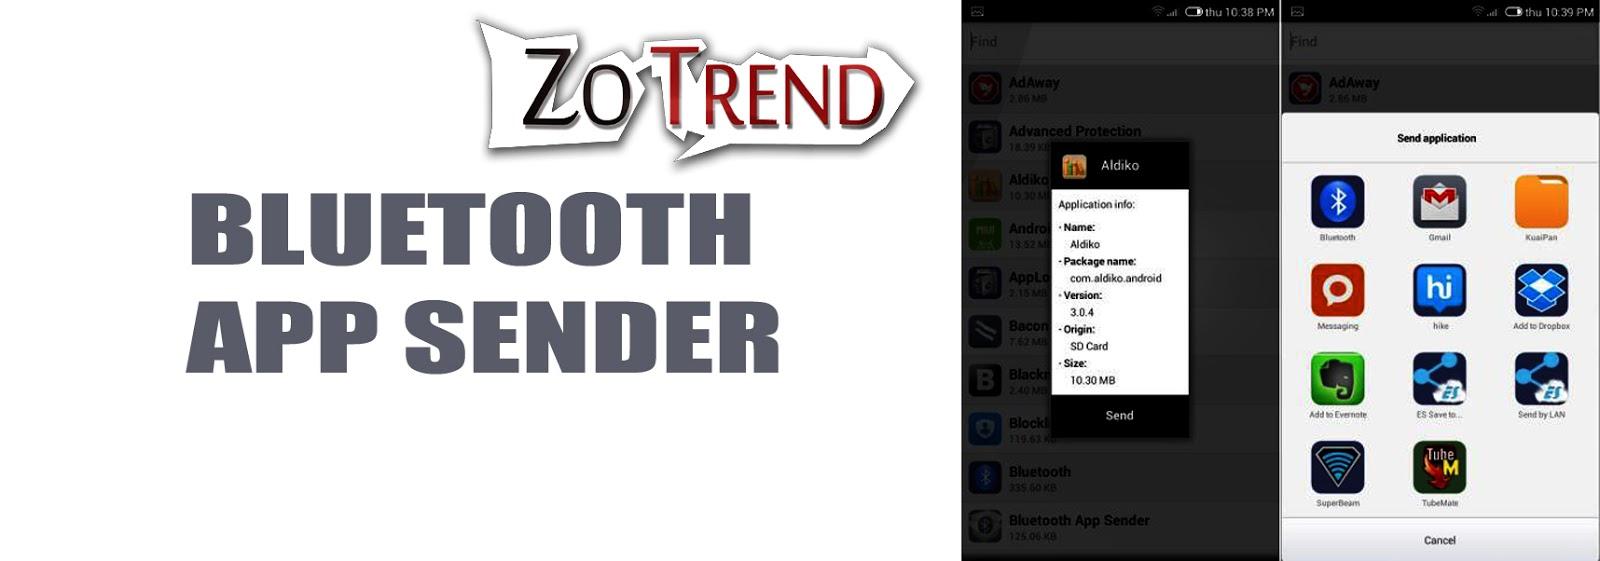 ANDROID APPS BLUETOOTH HMANGA THAWN DAN - Zo-Trend